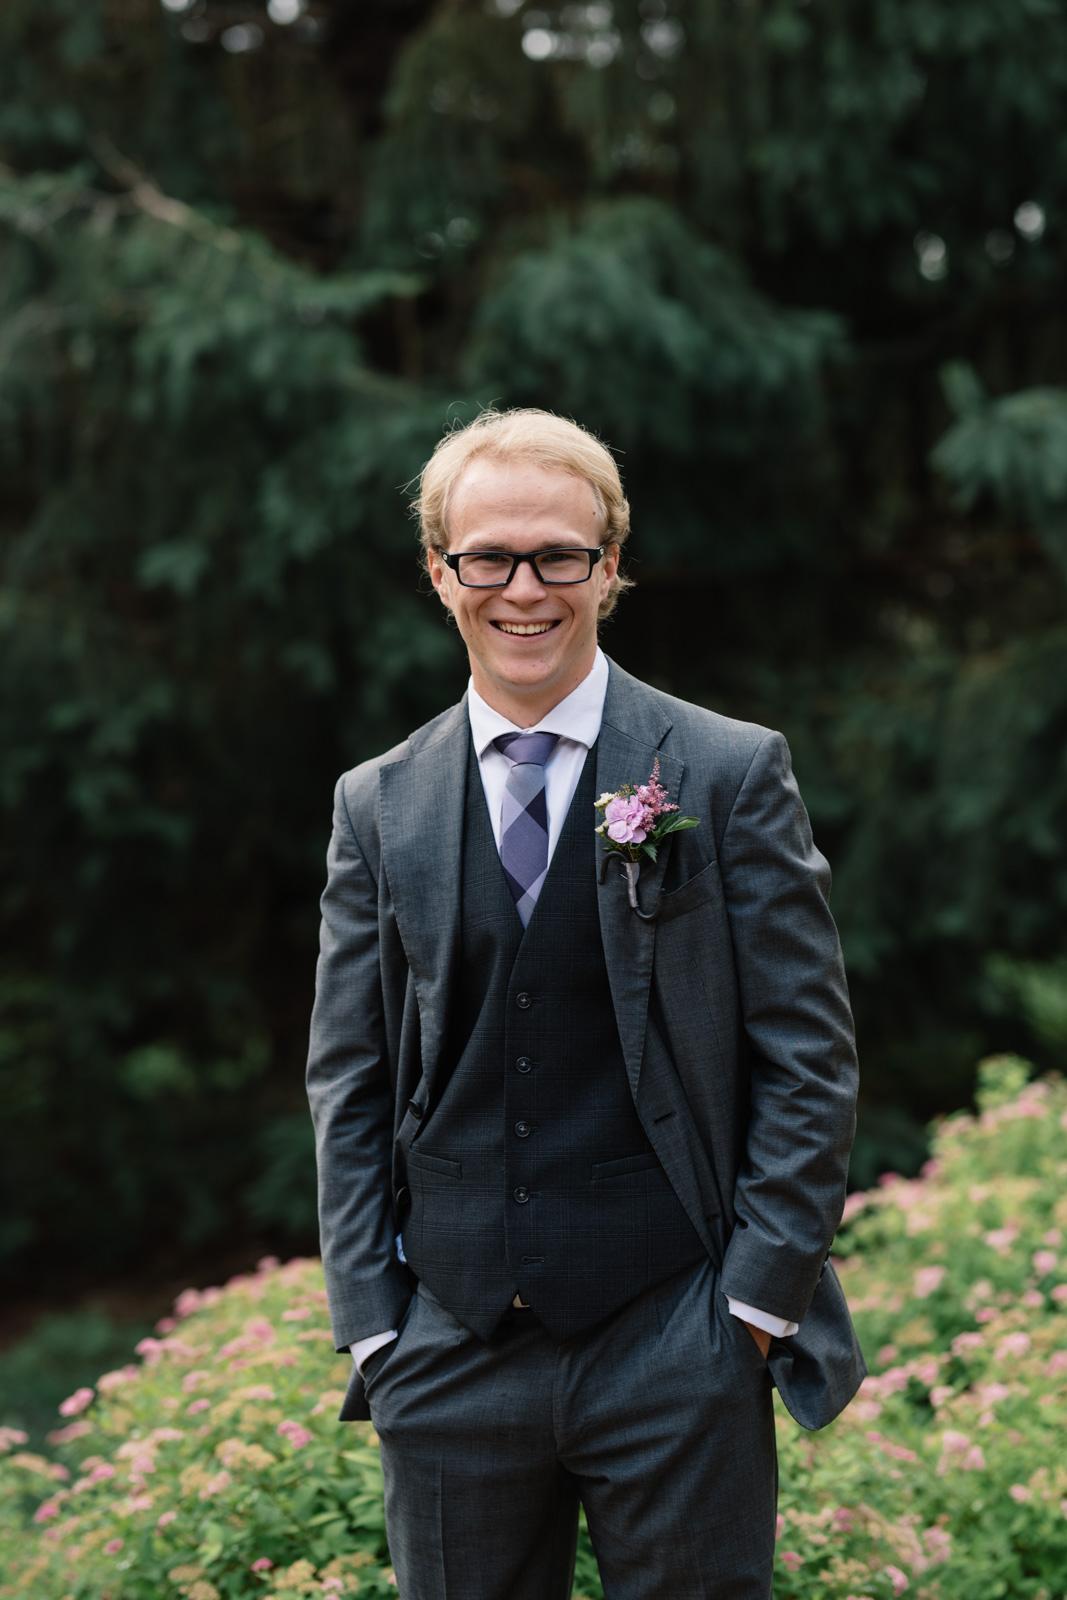 groom smiling waverly june wedding